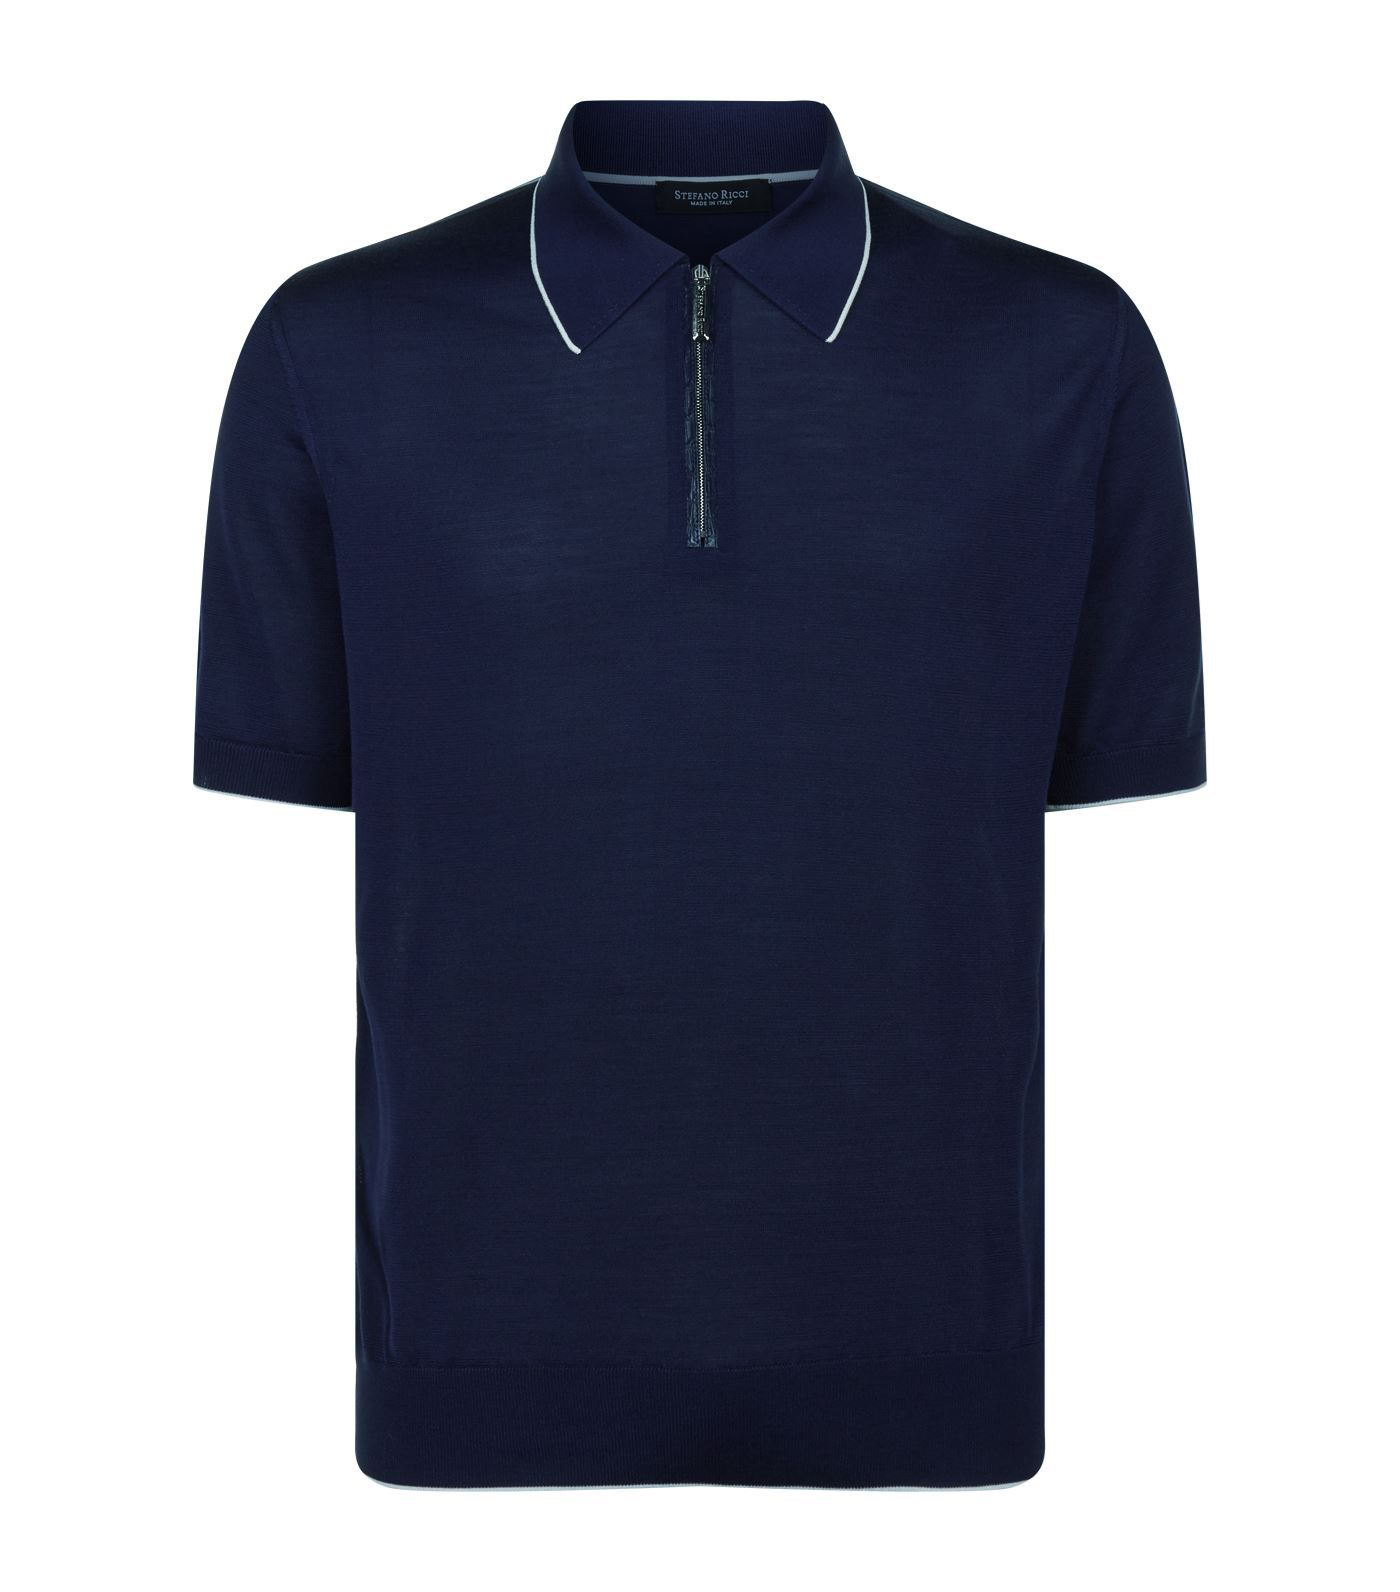 Stefano Ricci Dark blue Men/'s polo shirt